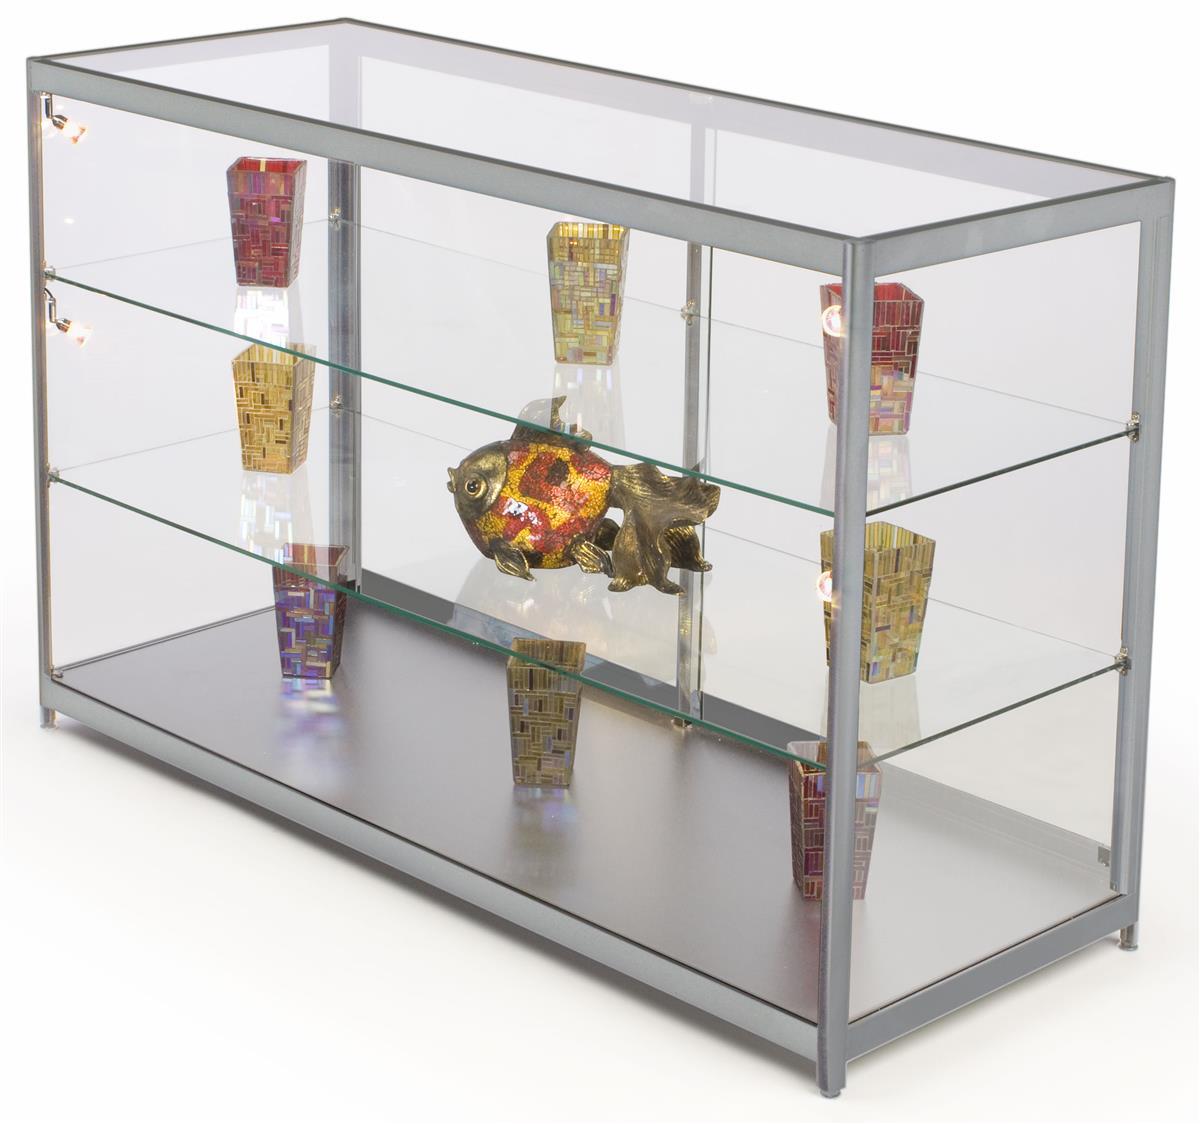 Supermarket Flower Arrangements Display Case Lighting: Tempered Glass Display Counter